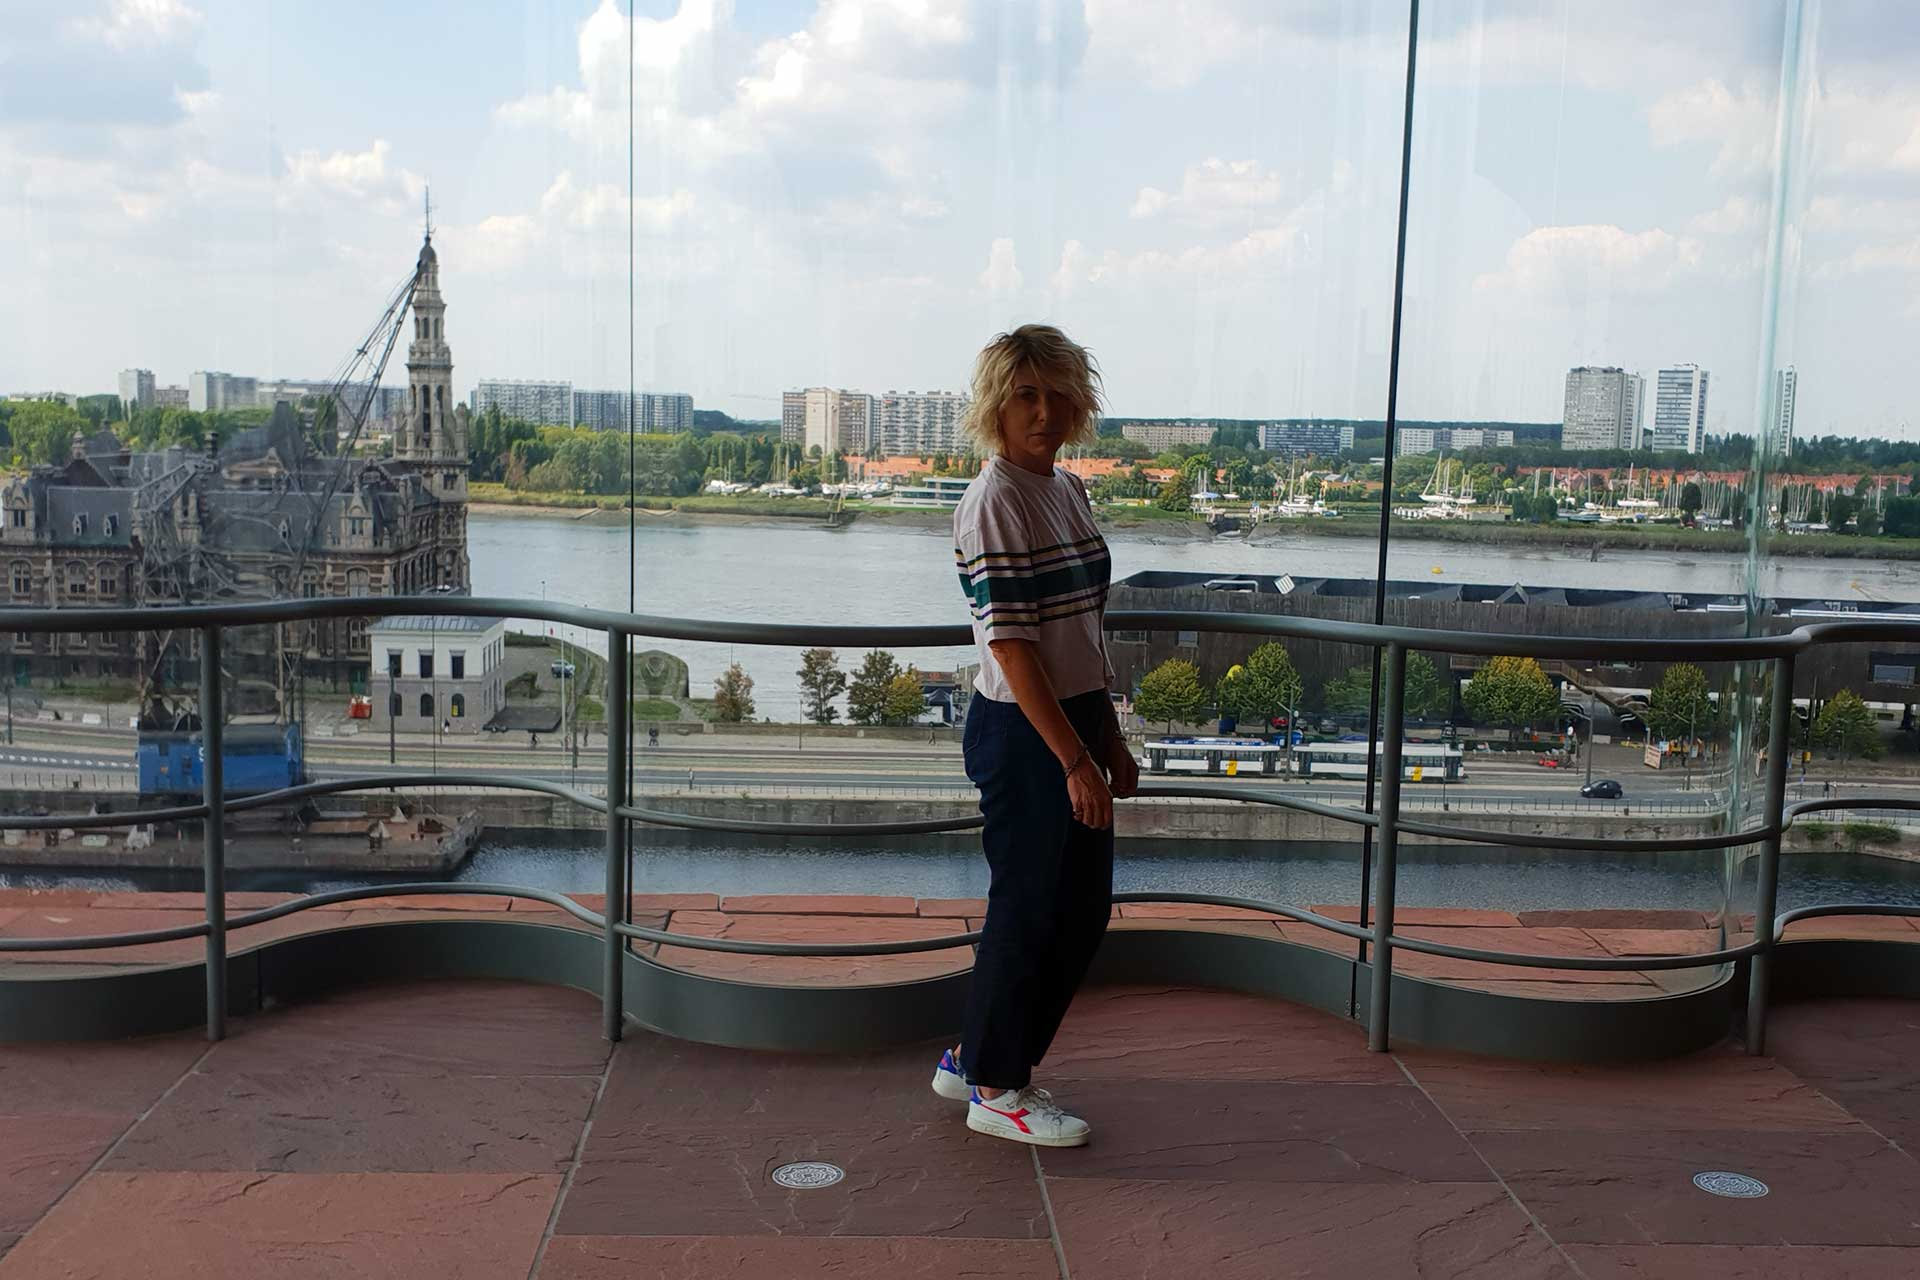 anversa: vista sulla città